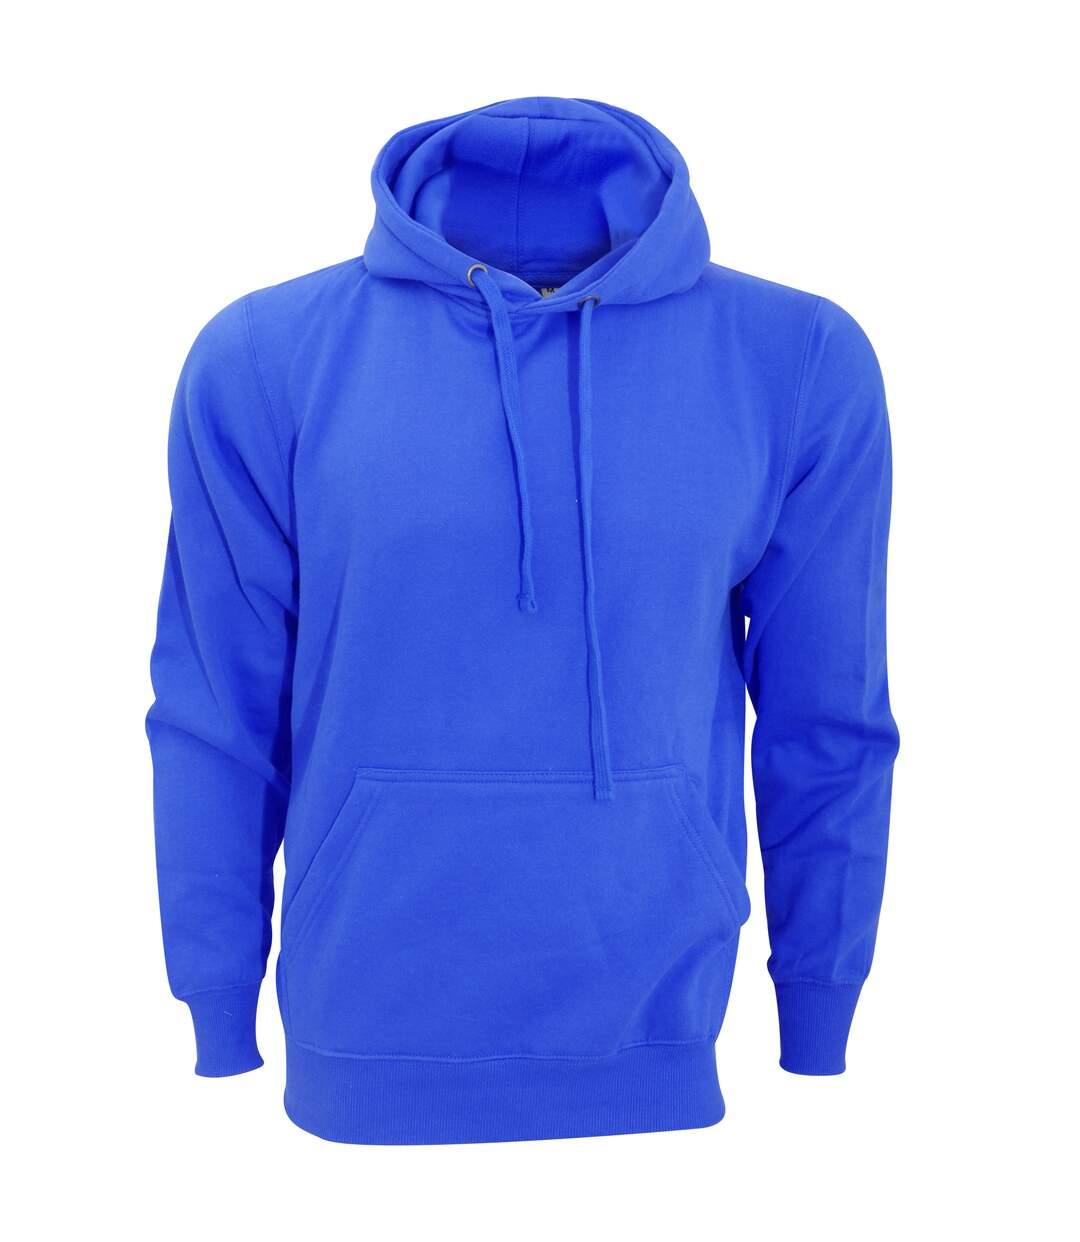 FDM Unisex Tagless Hooded Sweatshirt / Hoodie (Royal) - UTBC2031